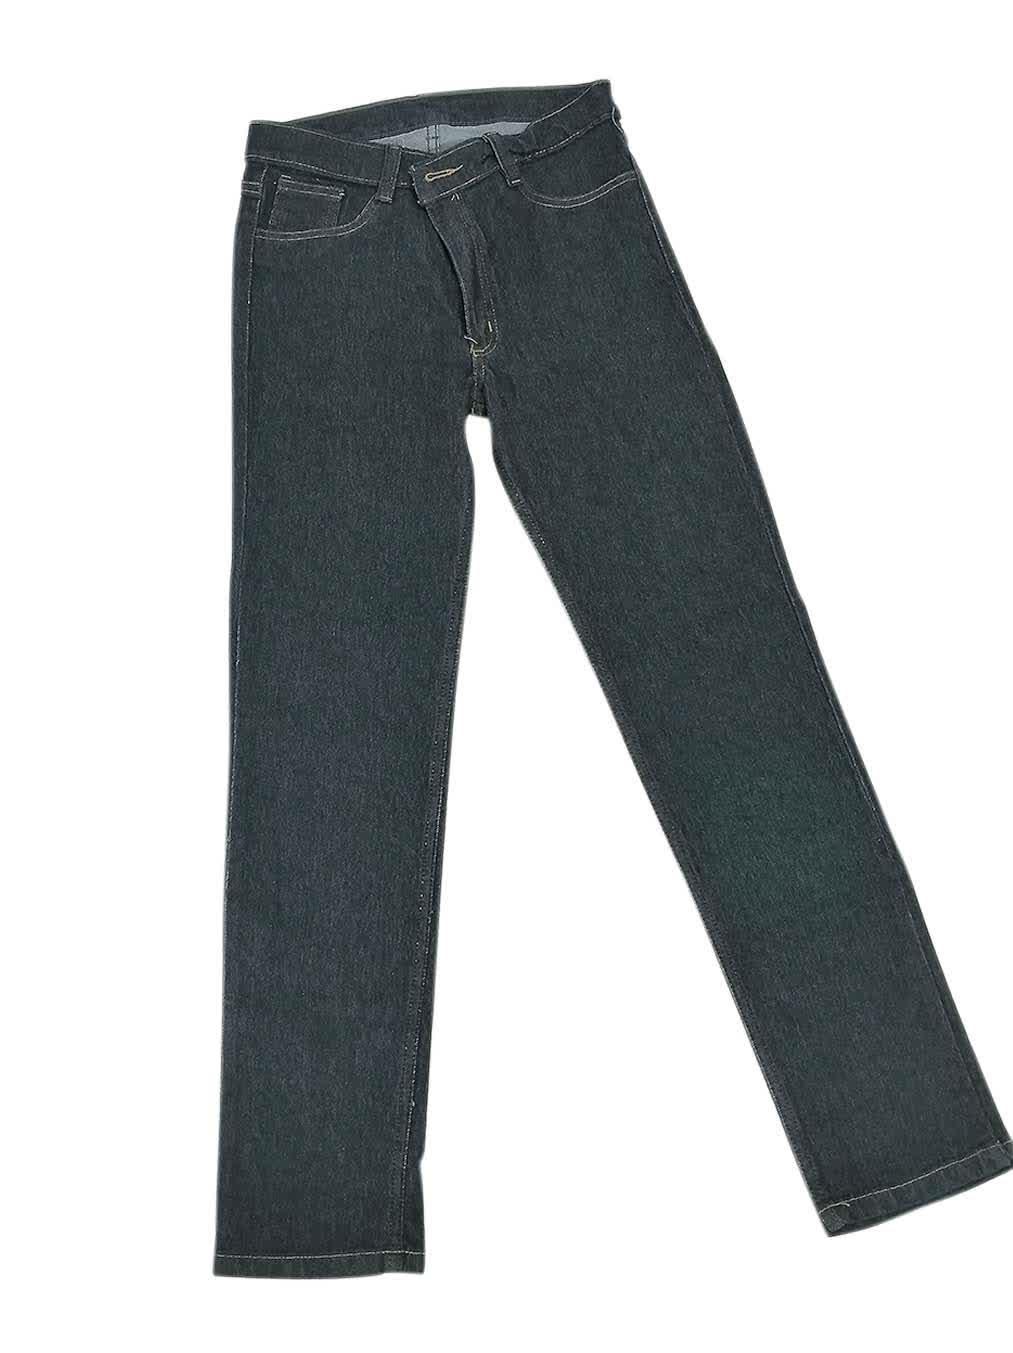 jean para uniformes